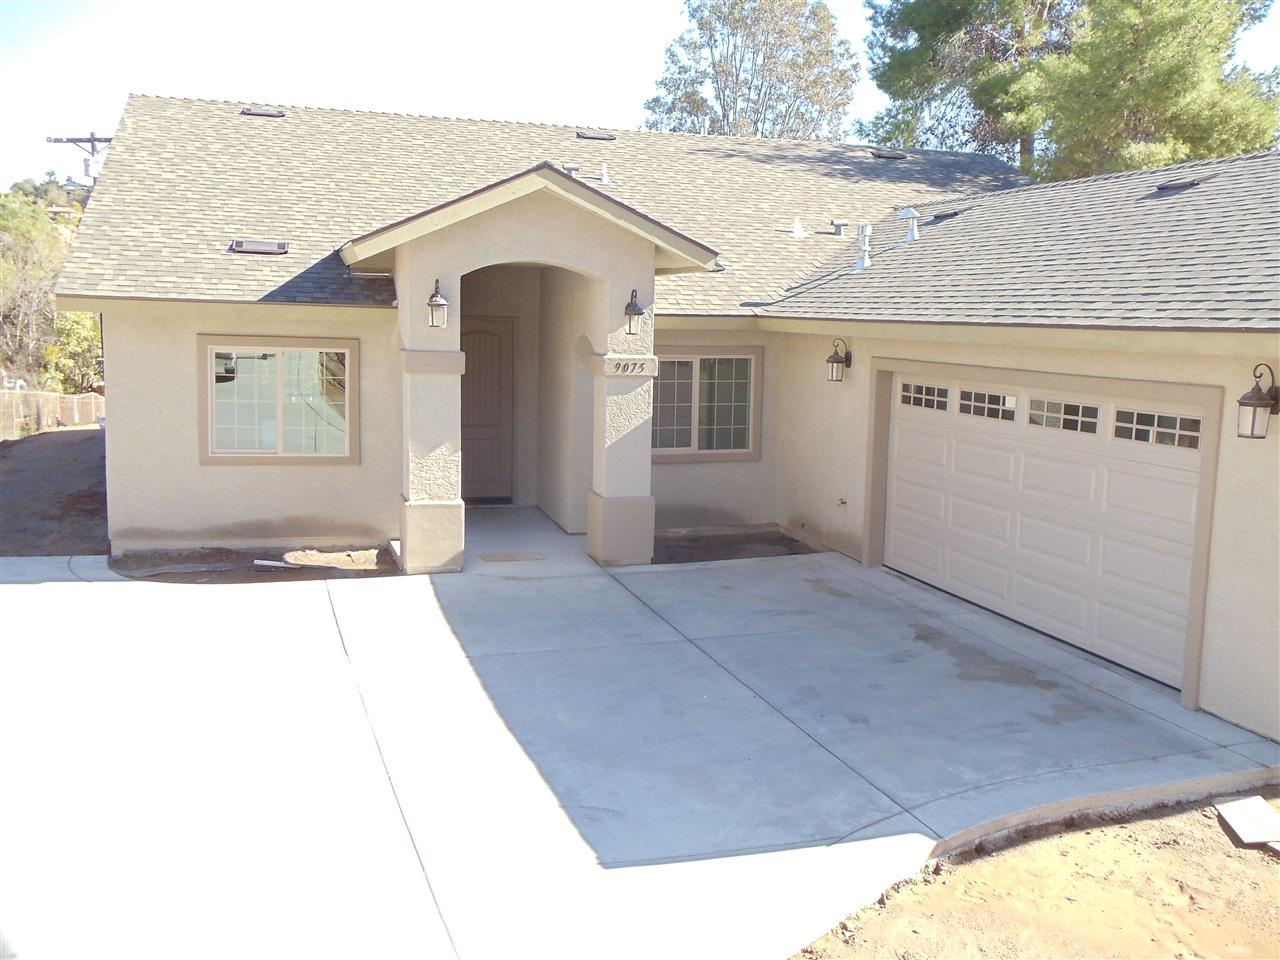 9075 Creekford, Lakeside, CA